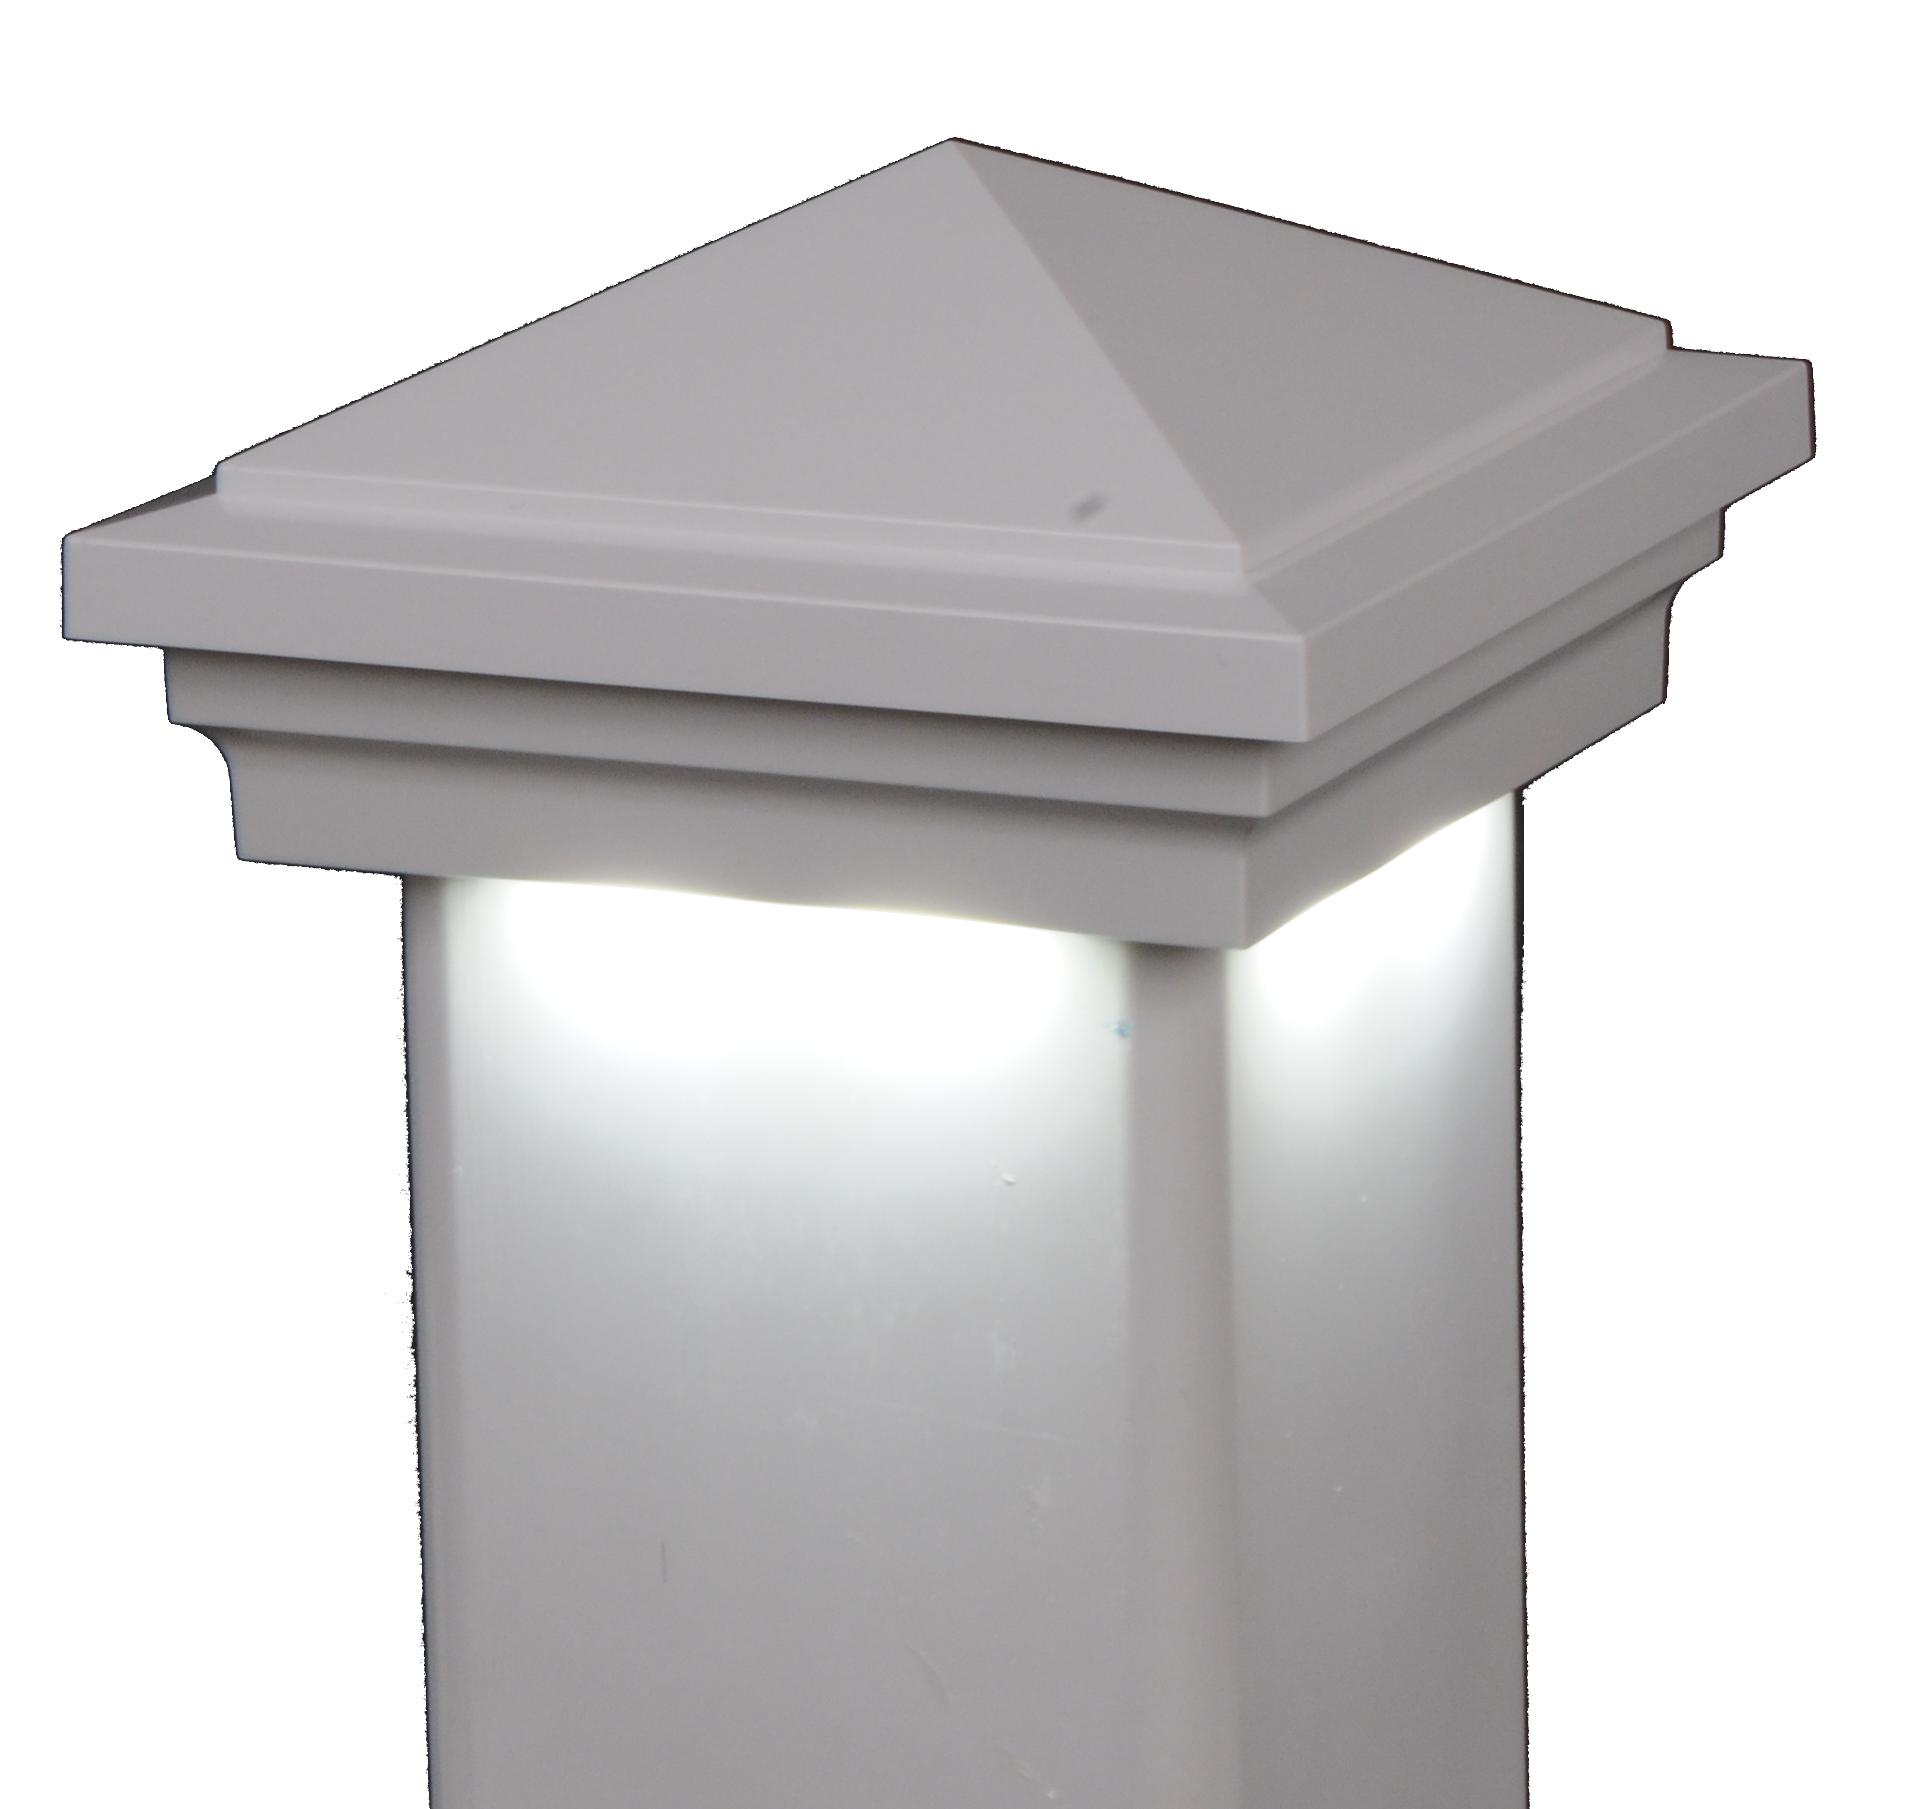 Haven Downward low voltage hard wired vinyl post cap lighting light LMT